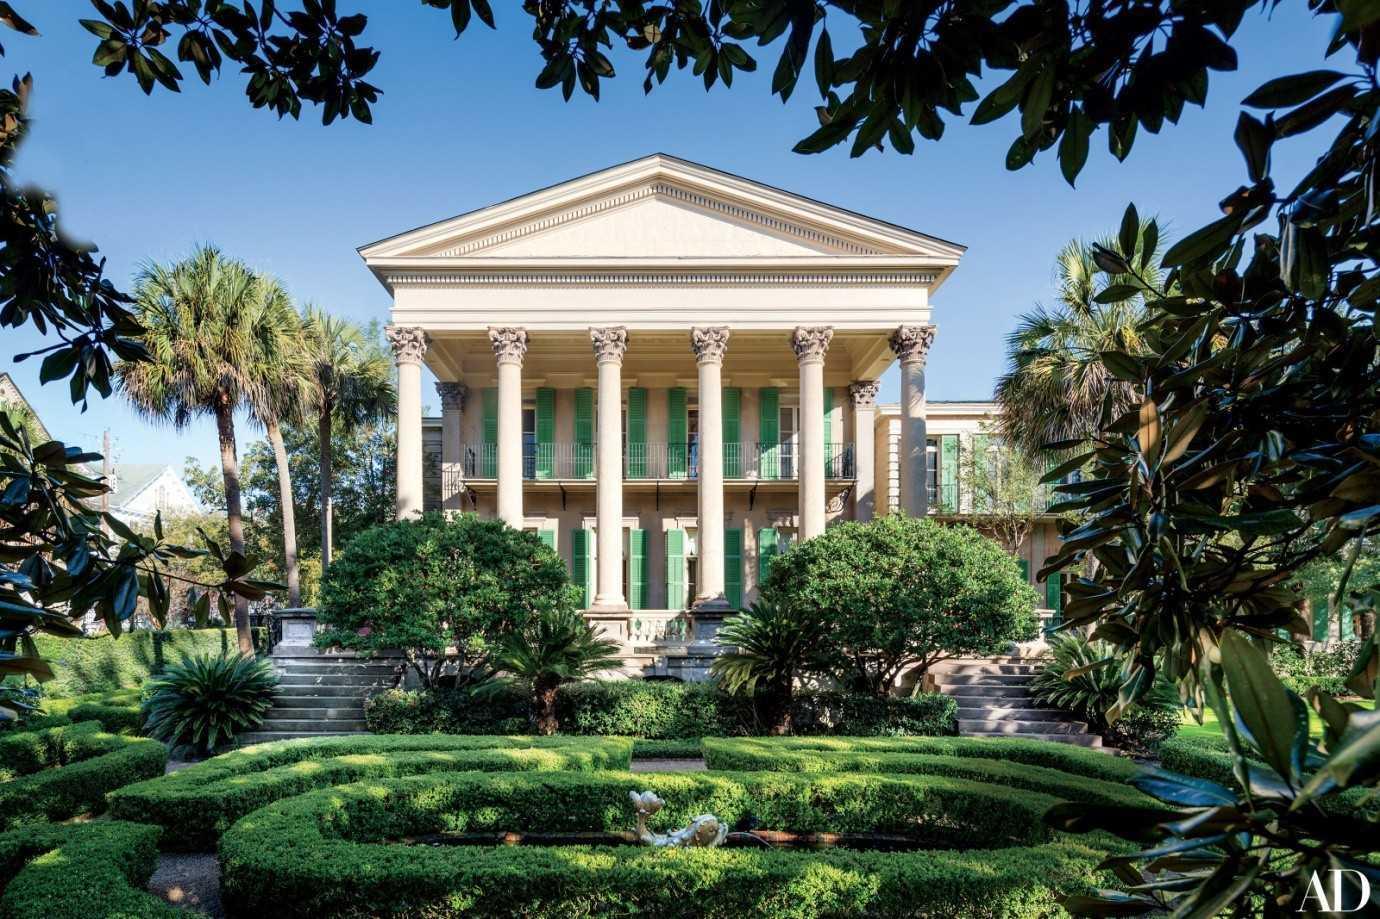 Desain rumah Patricia Altschul bergaya neoklasik karya Isaac Jenkins Mikell di Charleston, South Carolina [Sumber: architecturaldigest.com]